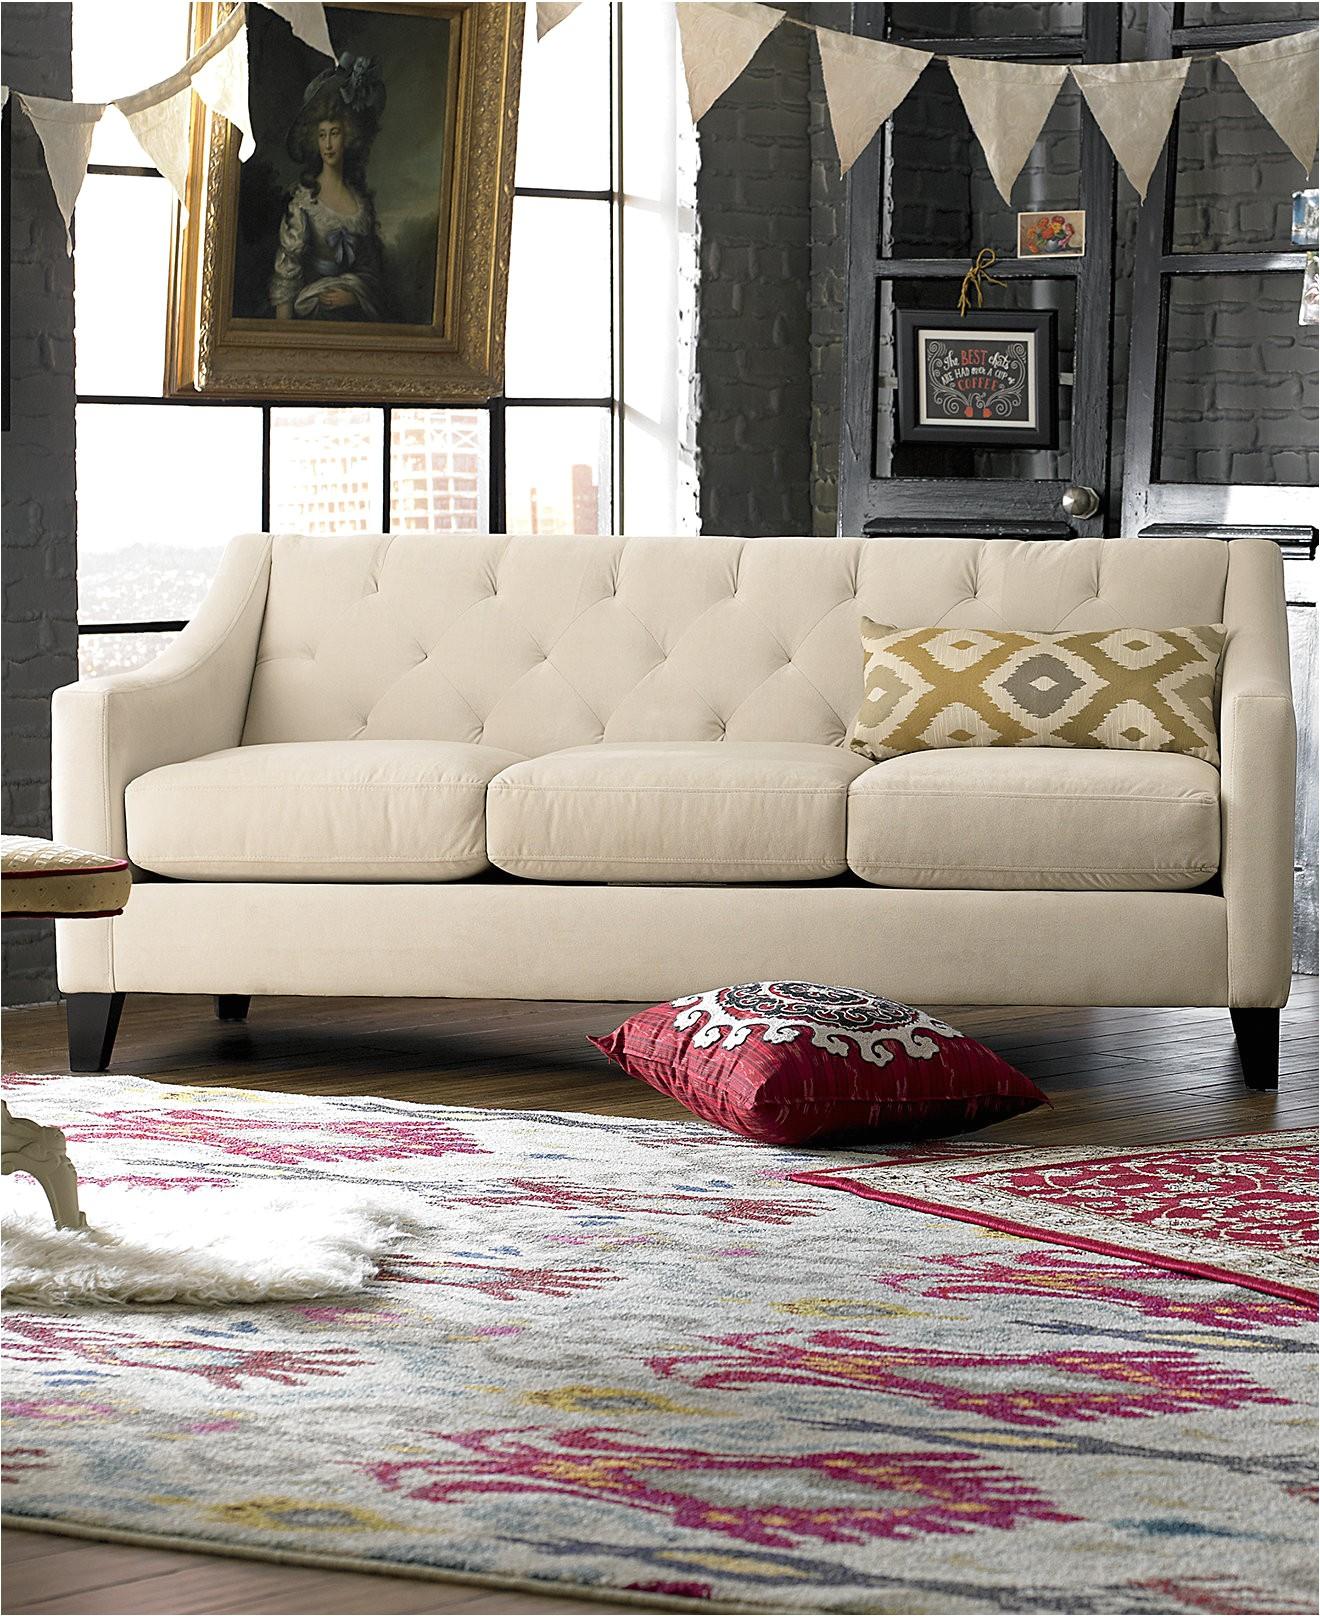 Chloe Velvet sofa Macys Exceptional Macys Living Room Chairs with Chloe Velvet Tufted sofa